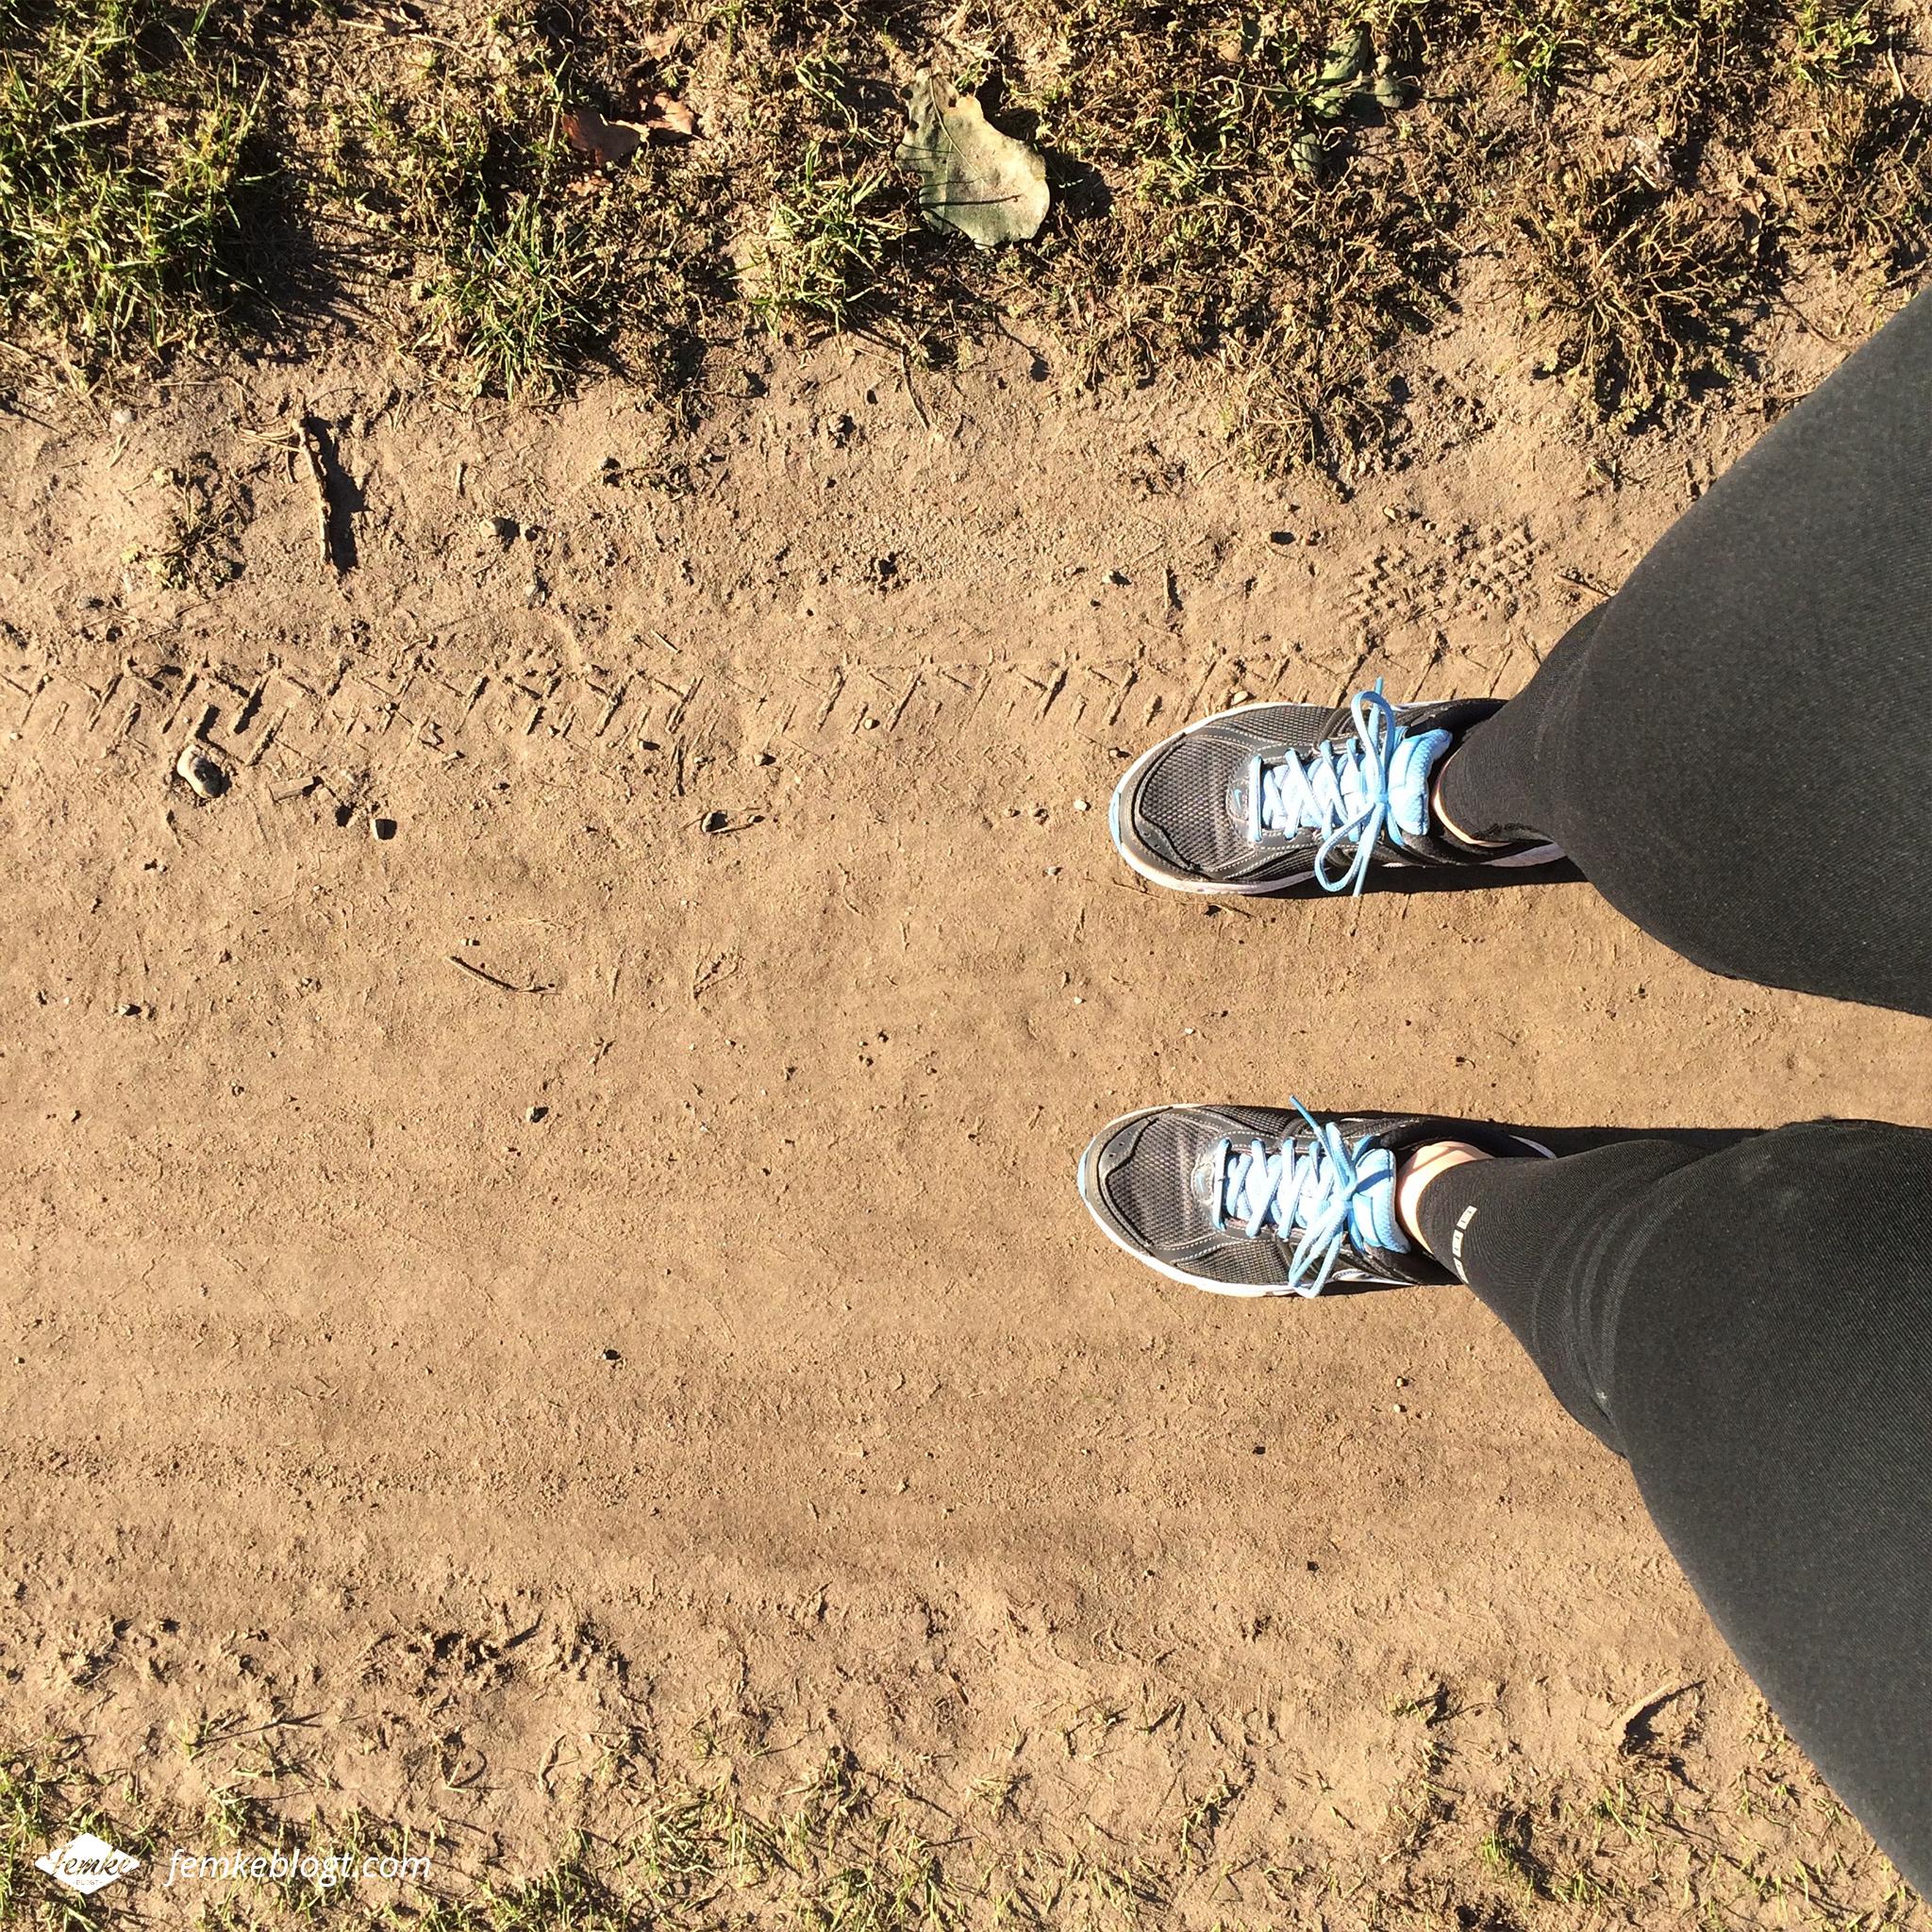 Oktober - Hardlopen in de zon